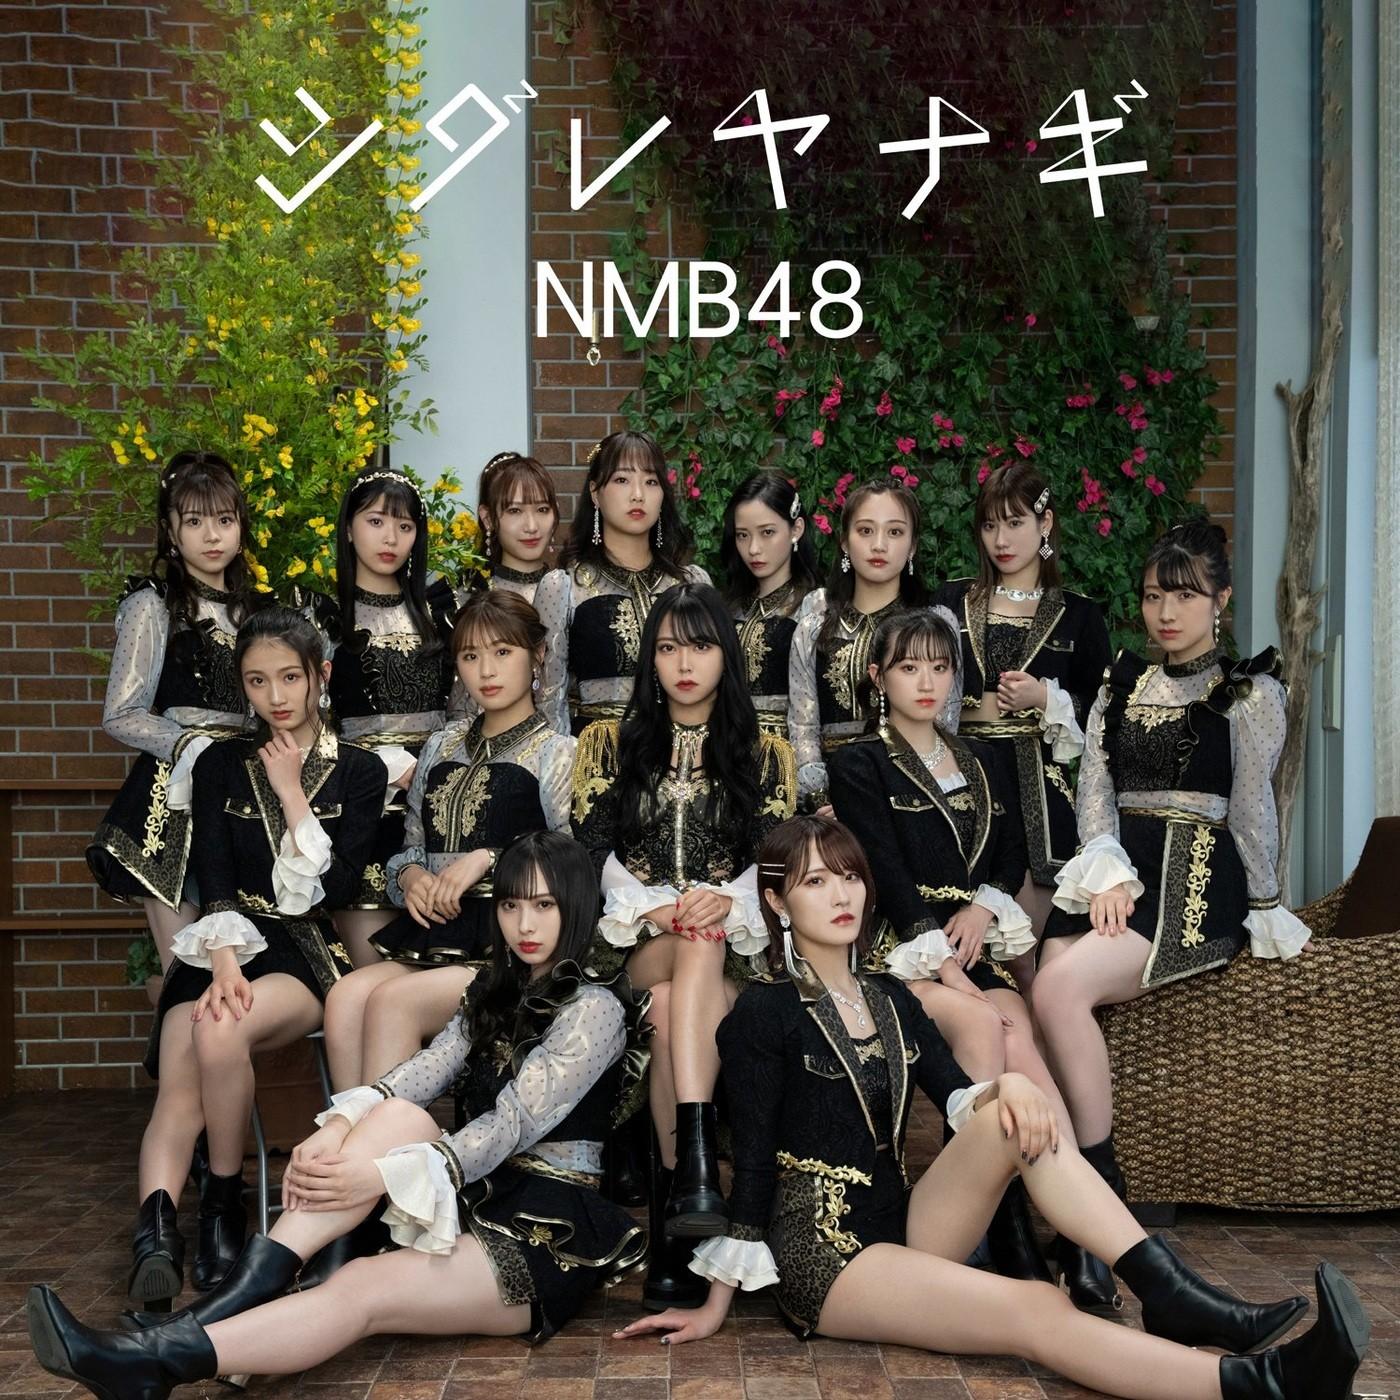 [Single] NMB48 – シダレヤナギ (Special Edition) [FLAC + MP3 320 / WEB] [2021.06.16]